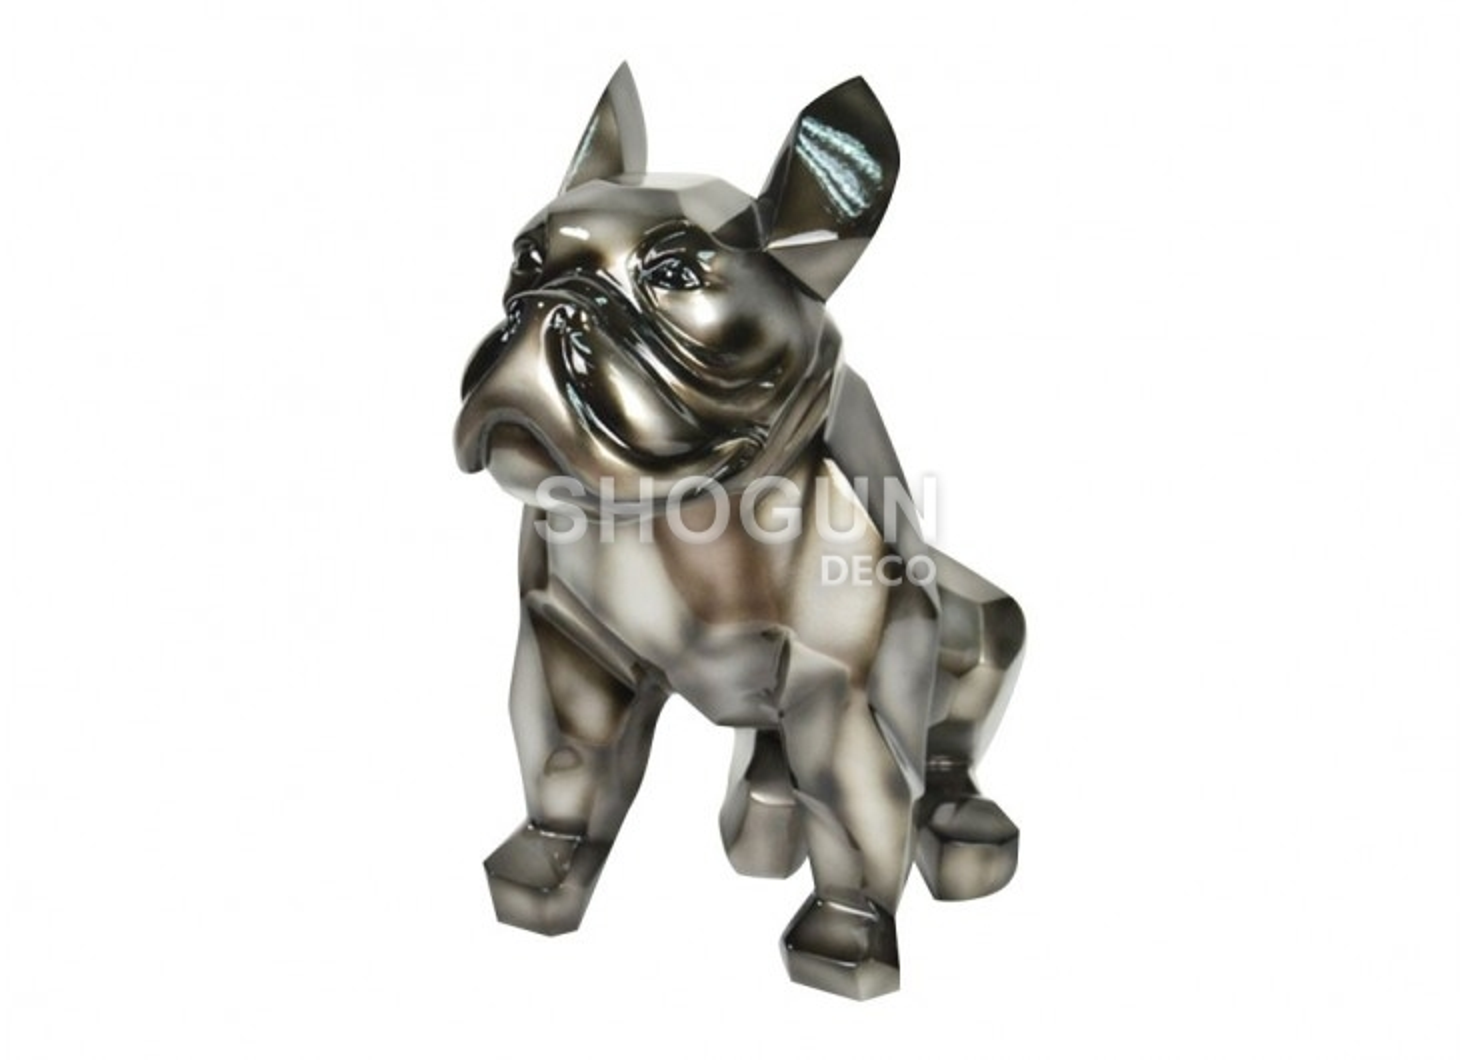 Statue of French bulldog